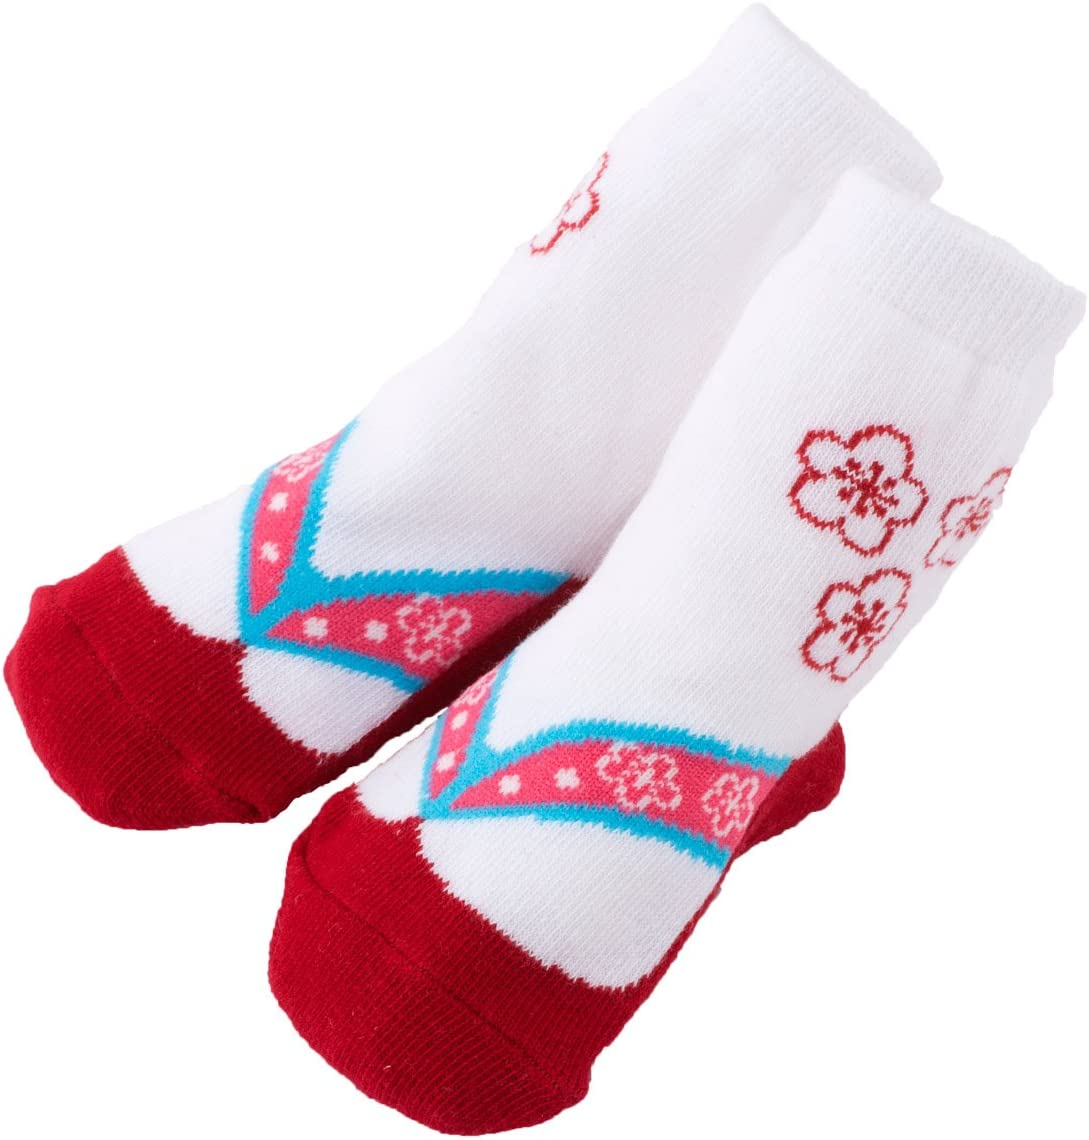 FUN fun (ファンファン) 足袋柄ソックス 女の子 赤ちゃん 12~15サイズ